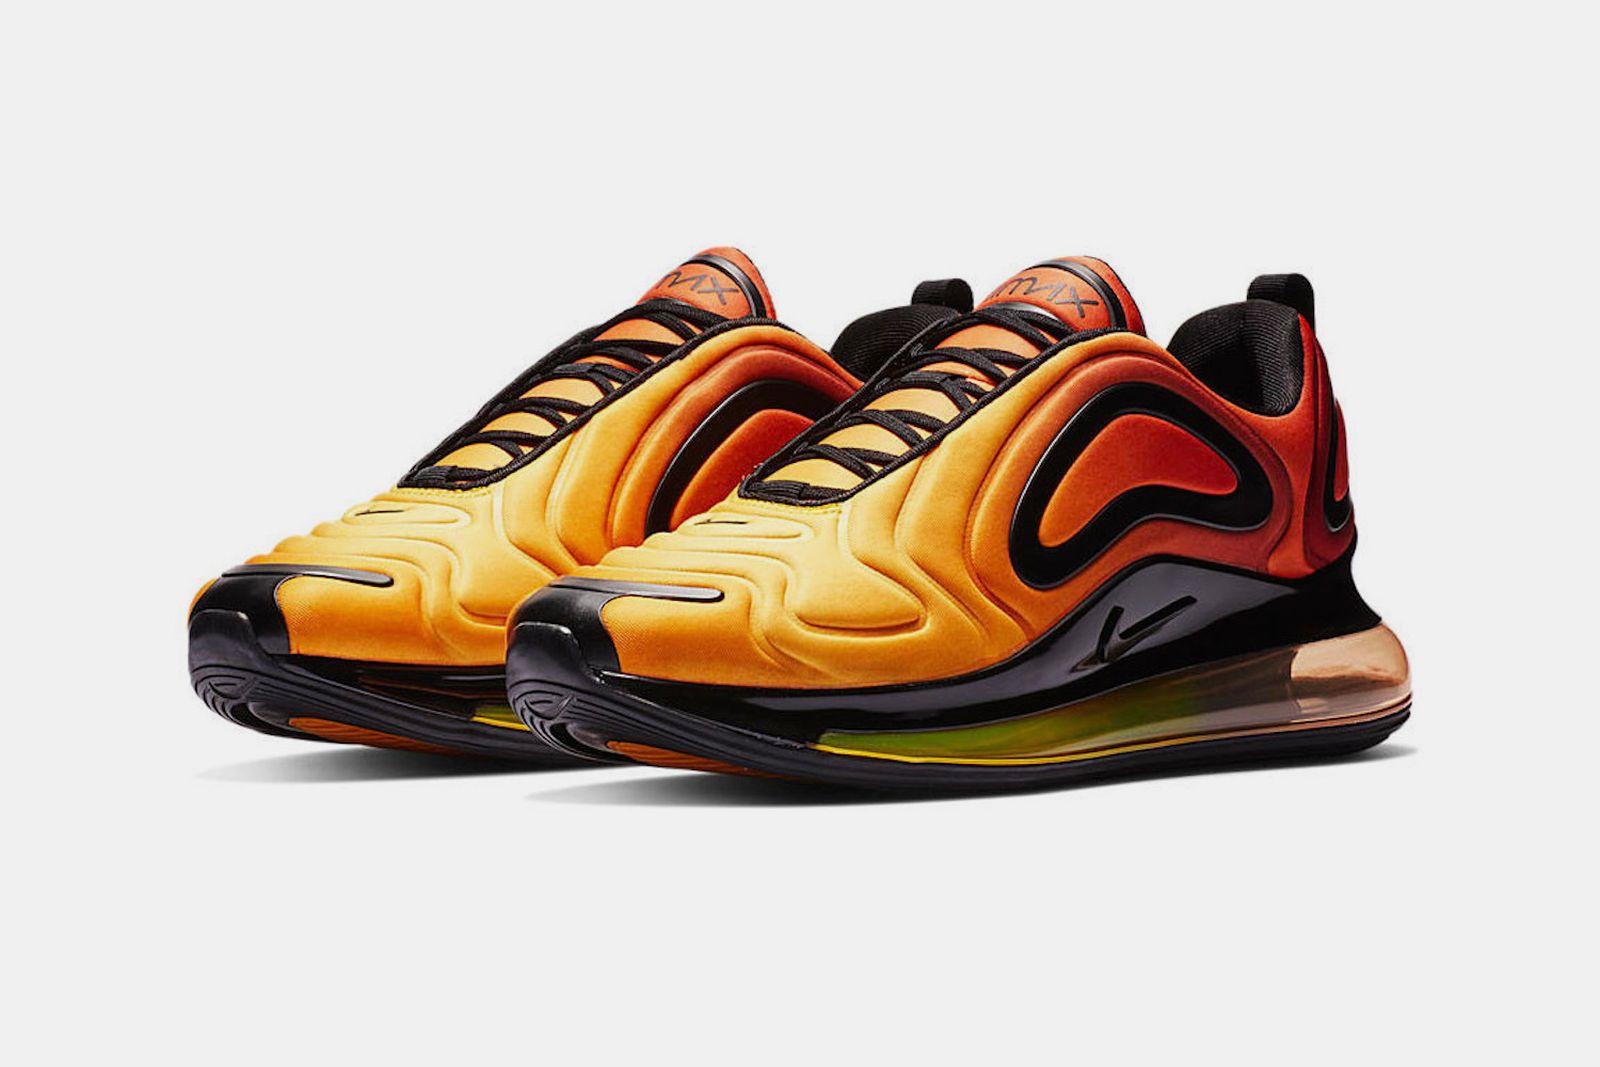 nike air max 720 2019 colorways release date price info NikePlus